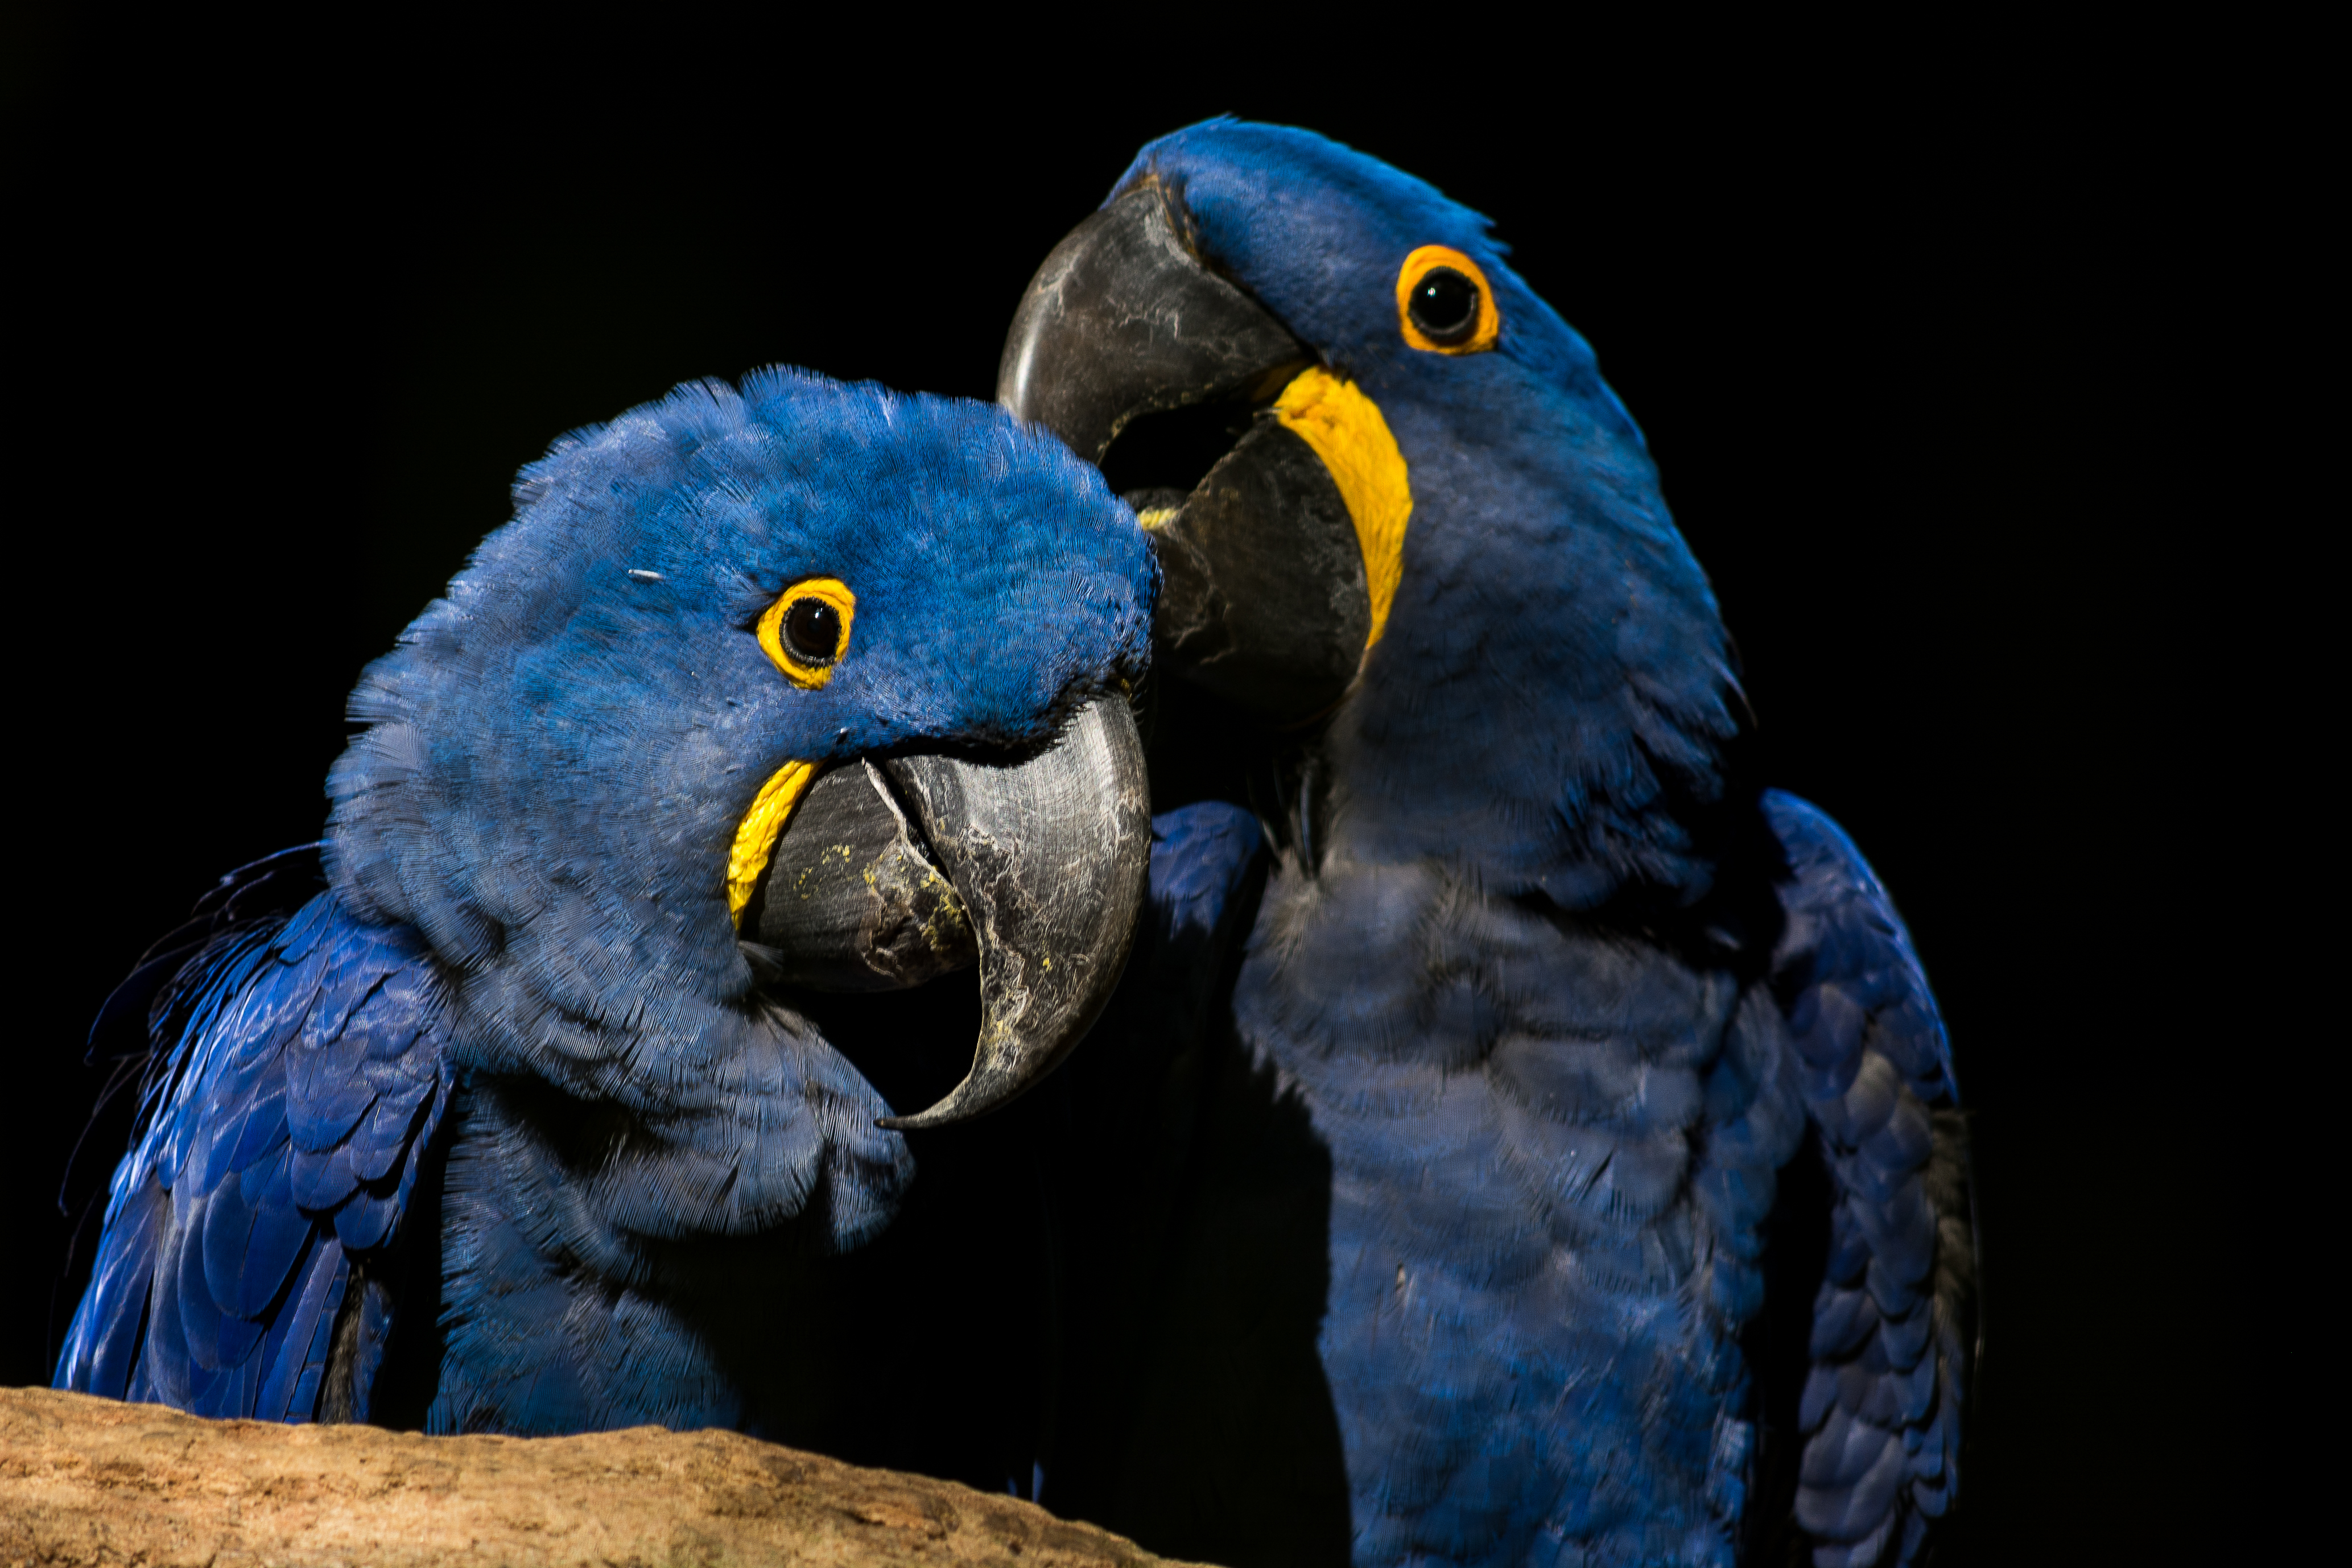 Conhecido File:Arara-azul.jpg - Wikimedia Commons WC37